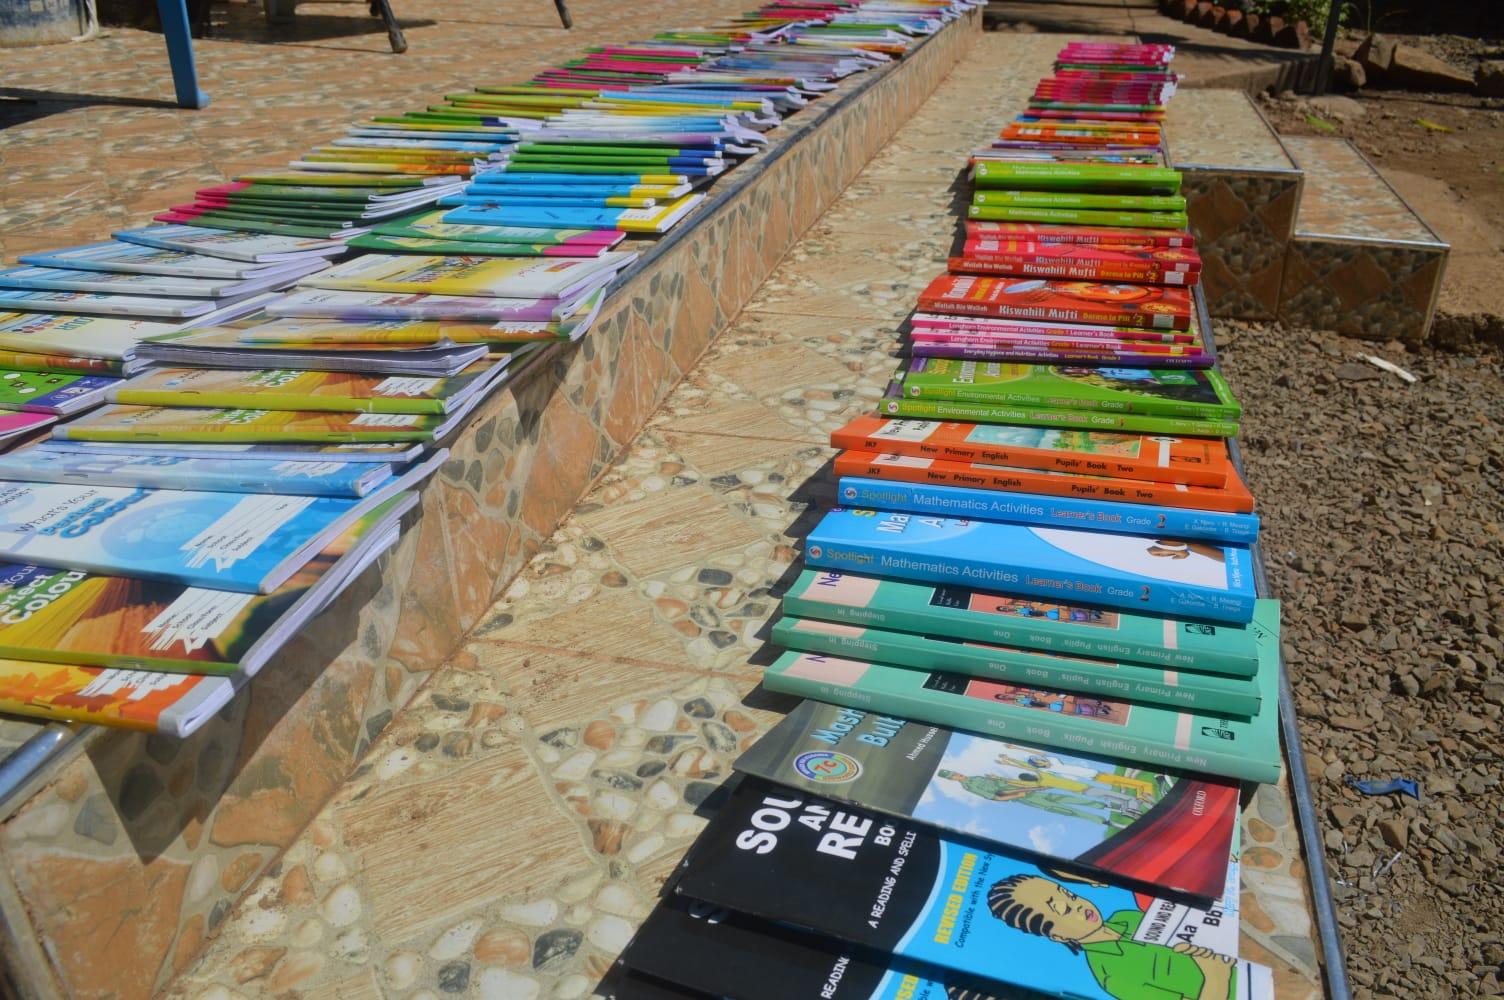 School Supplies - Rural schools lack funding. We provided classroom supplies and recess equipment!